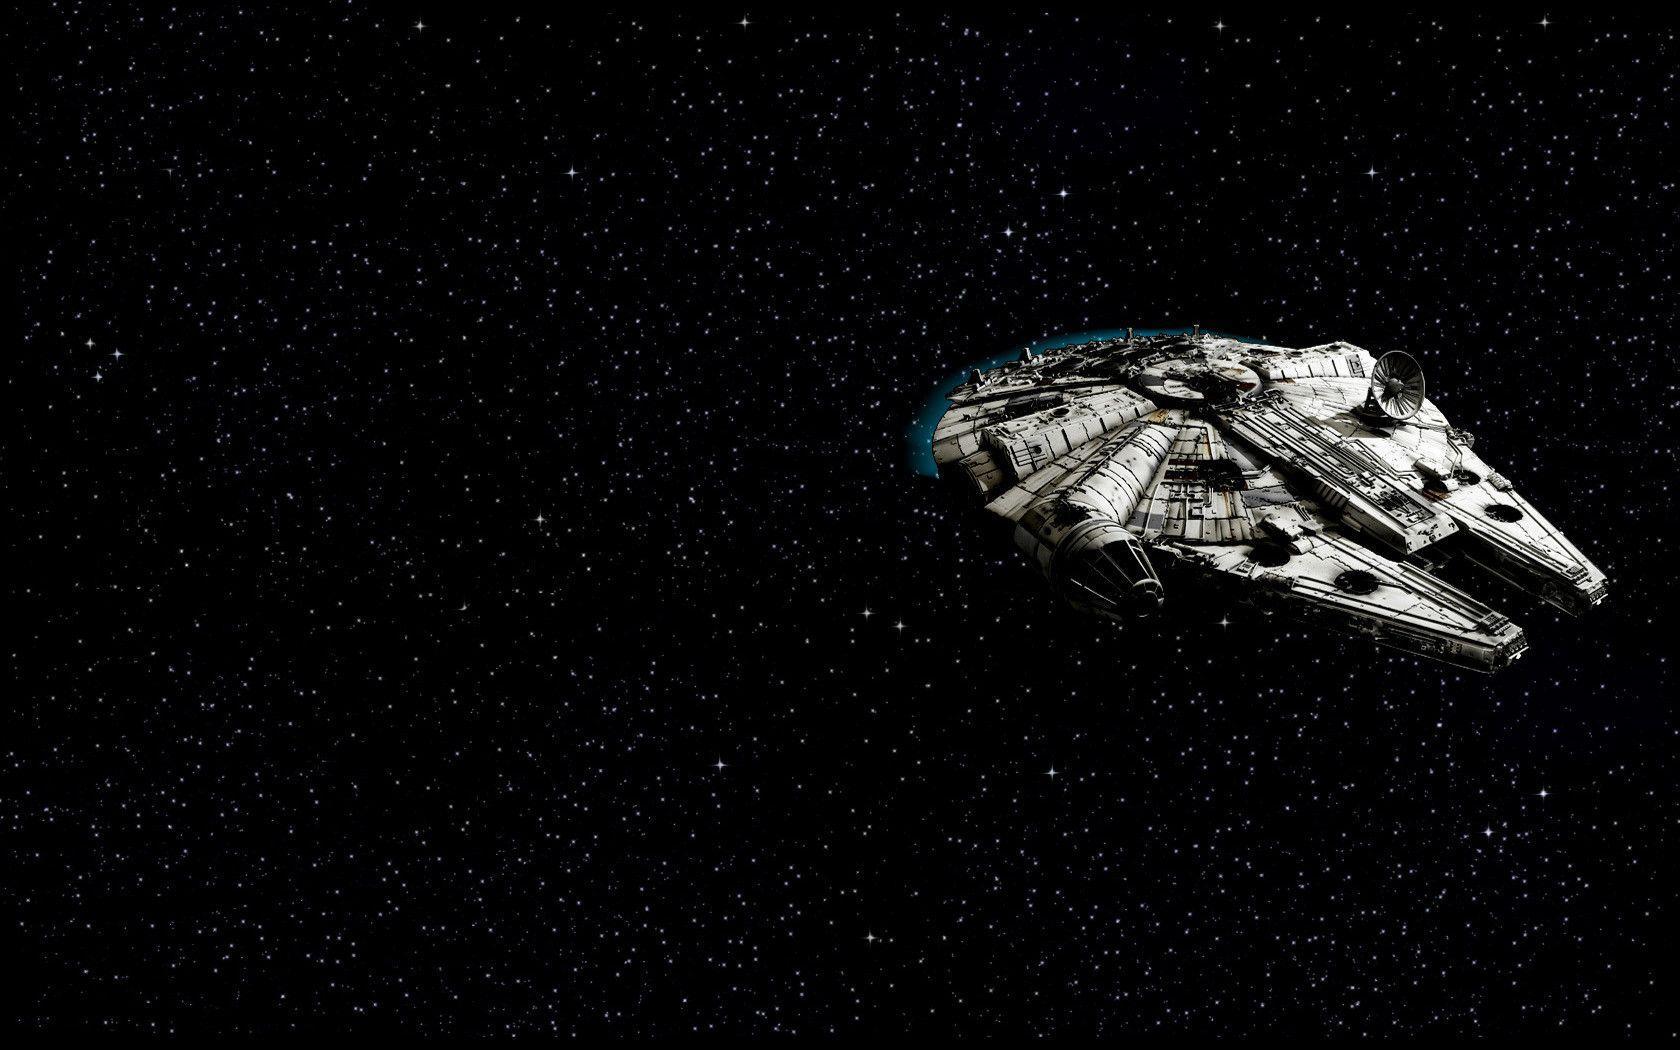 Download Star Wars Wallpaper 1680x1050